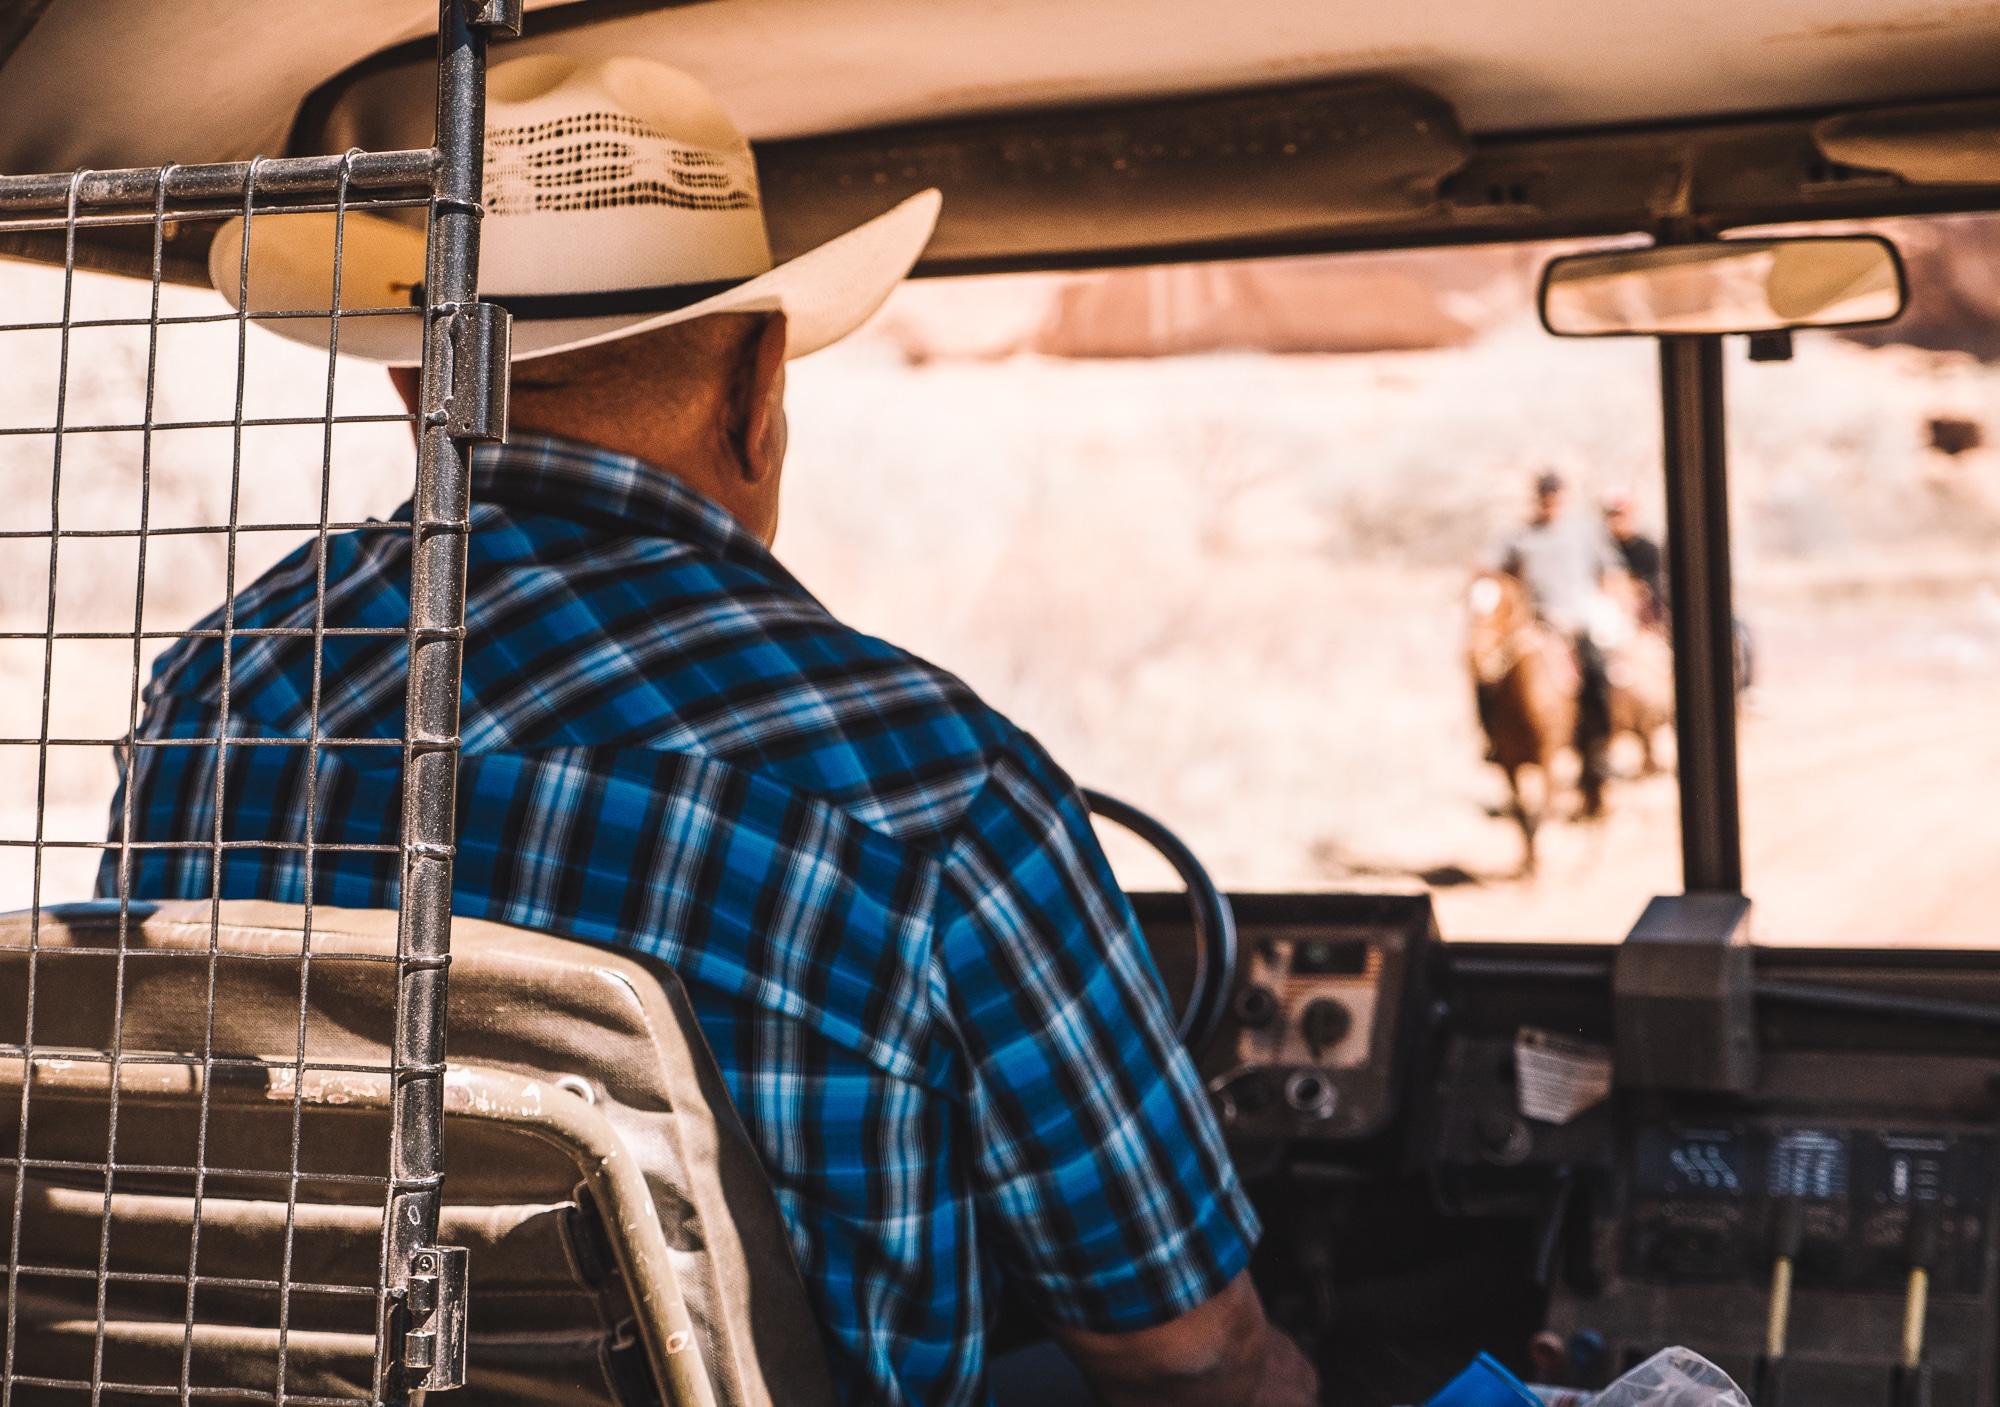 Roadtrip en arizona-roadtrip ouest americain-visiter l'arizona-roadtrip de 8 jours en arizona-Canyon de Chelly